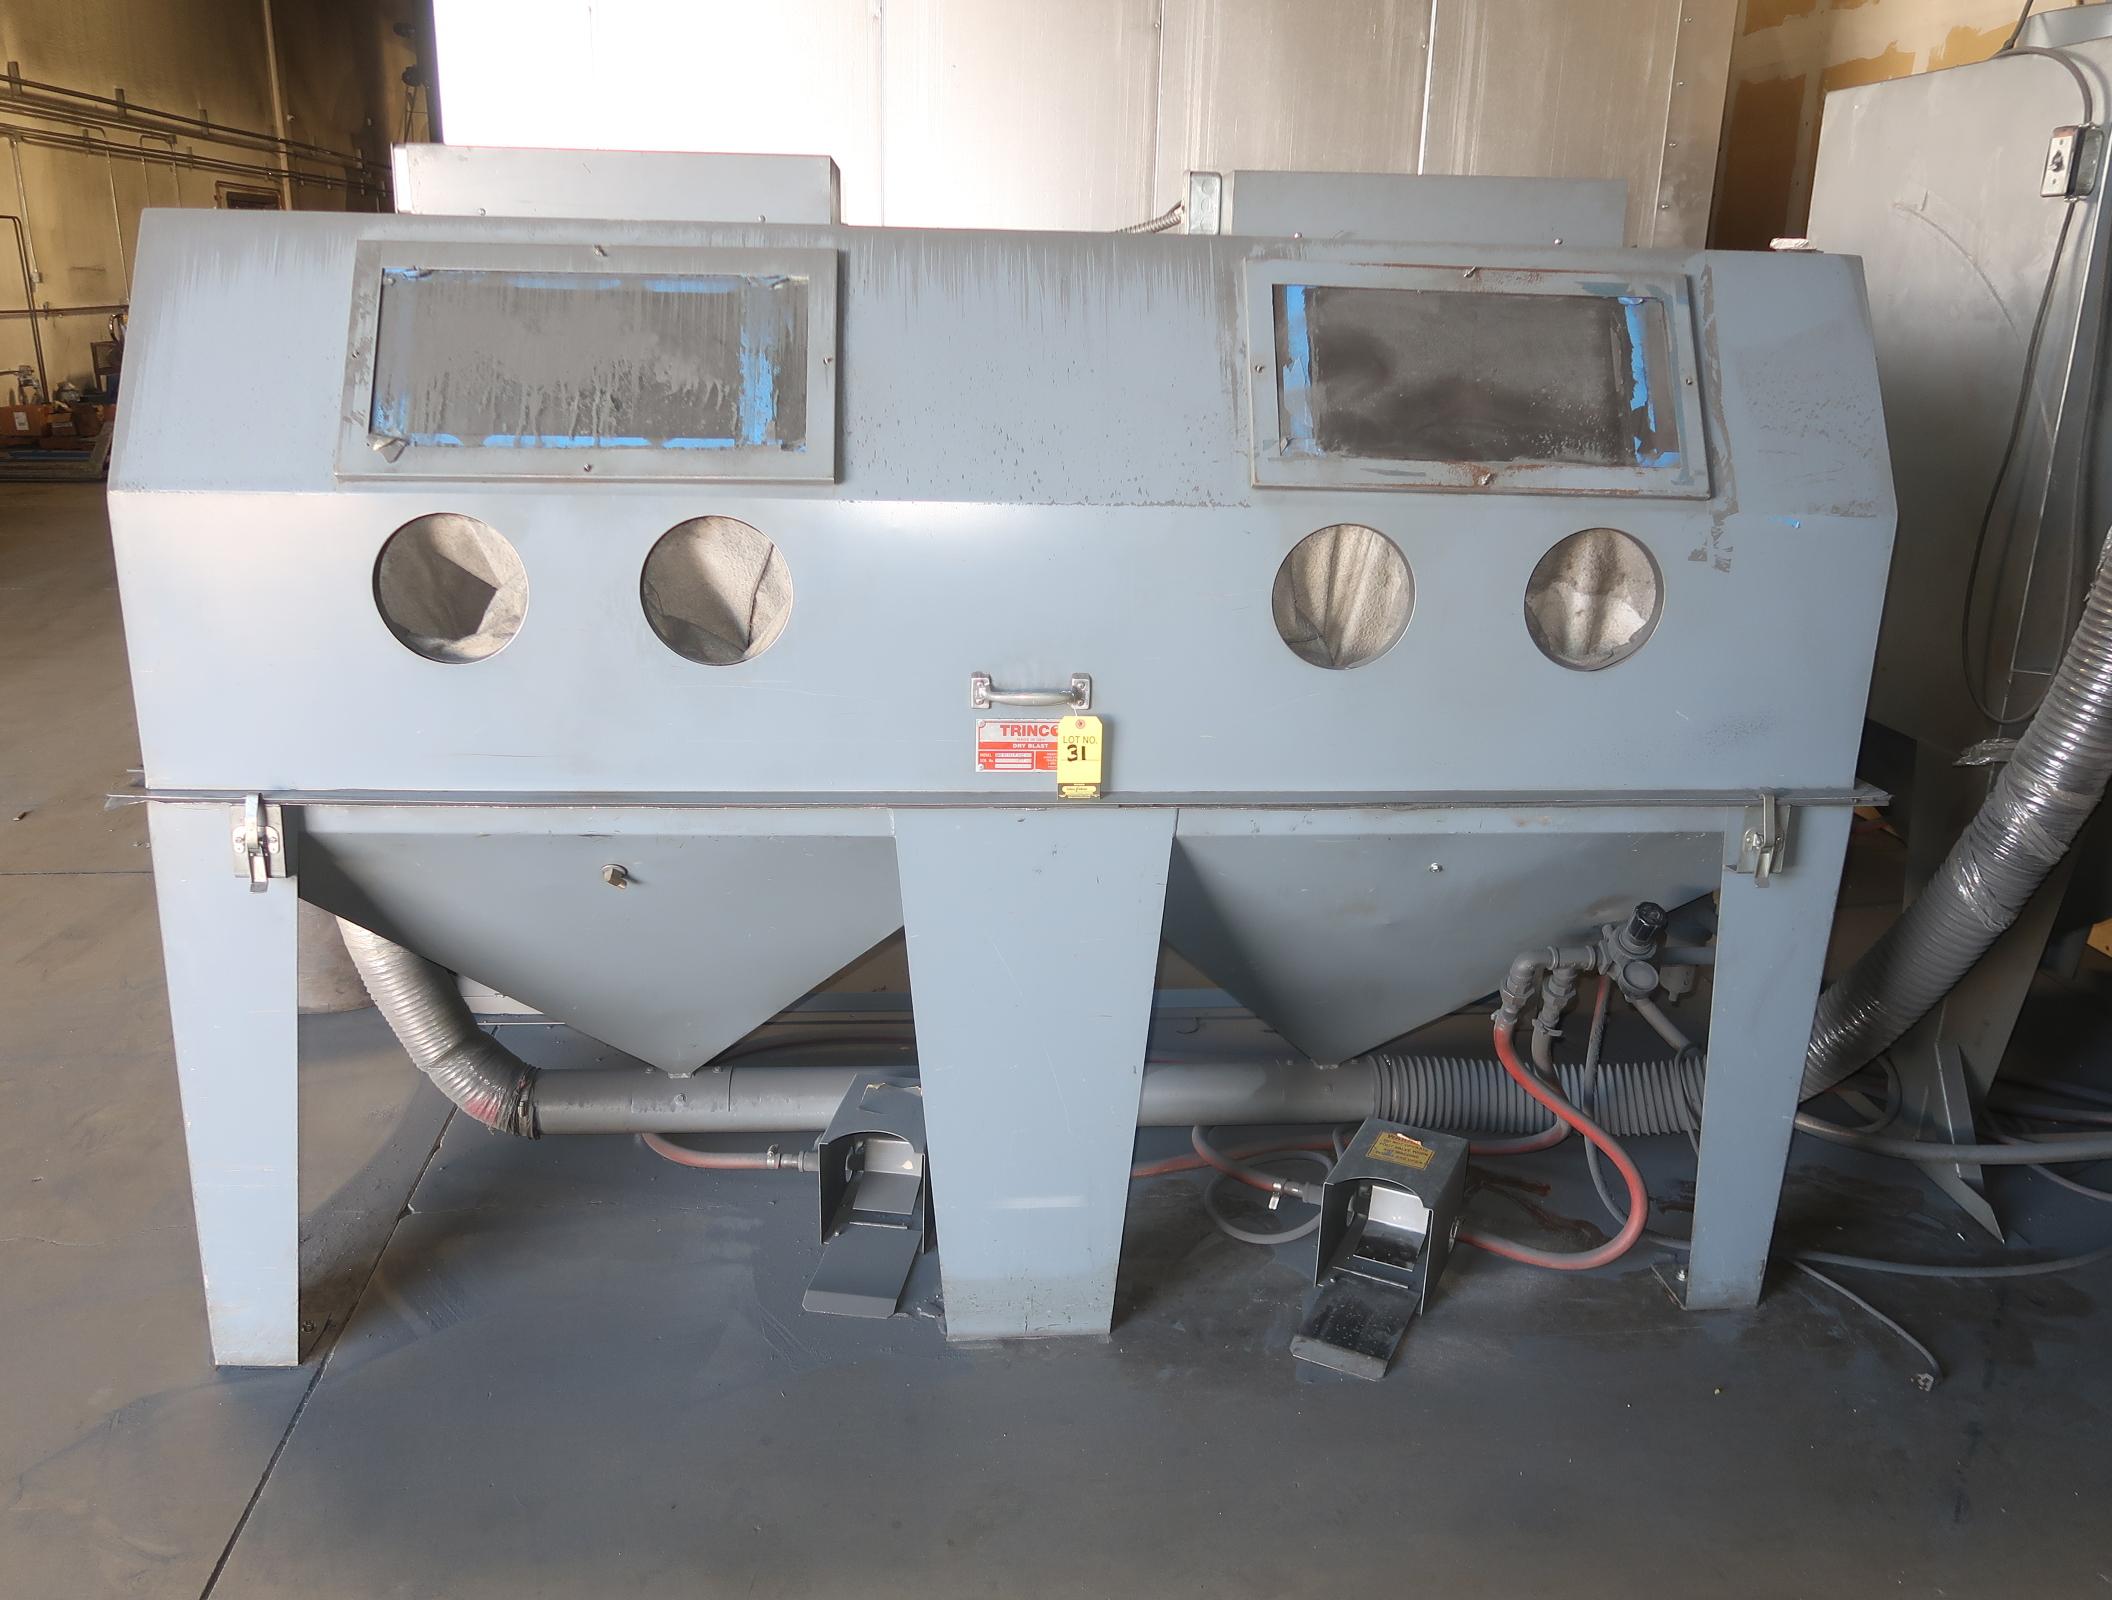 Lot 31 - TRINCO 2 STATION DRY BLAST BOOTH W/ COLLECTOR MDL. 96X48SL/PC-1 SN. 74191-14